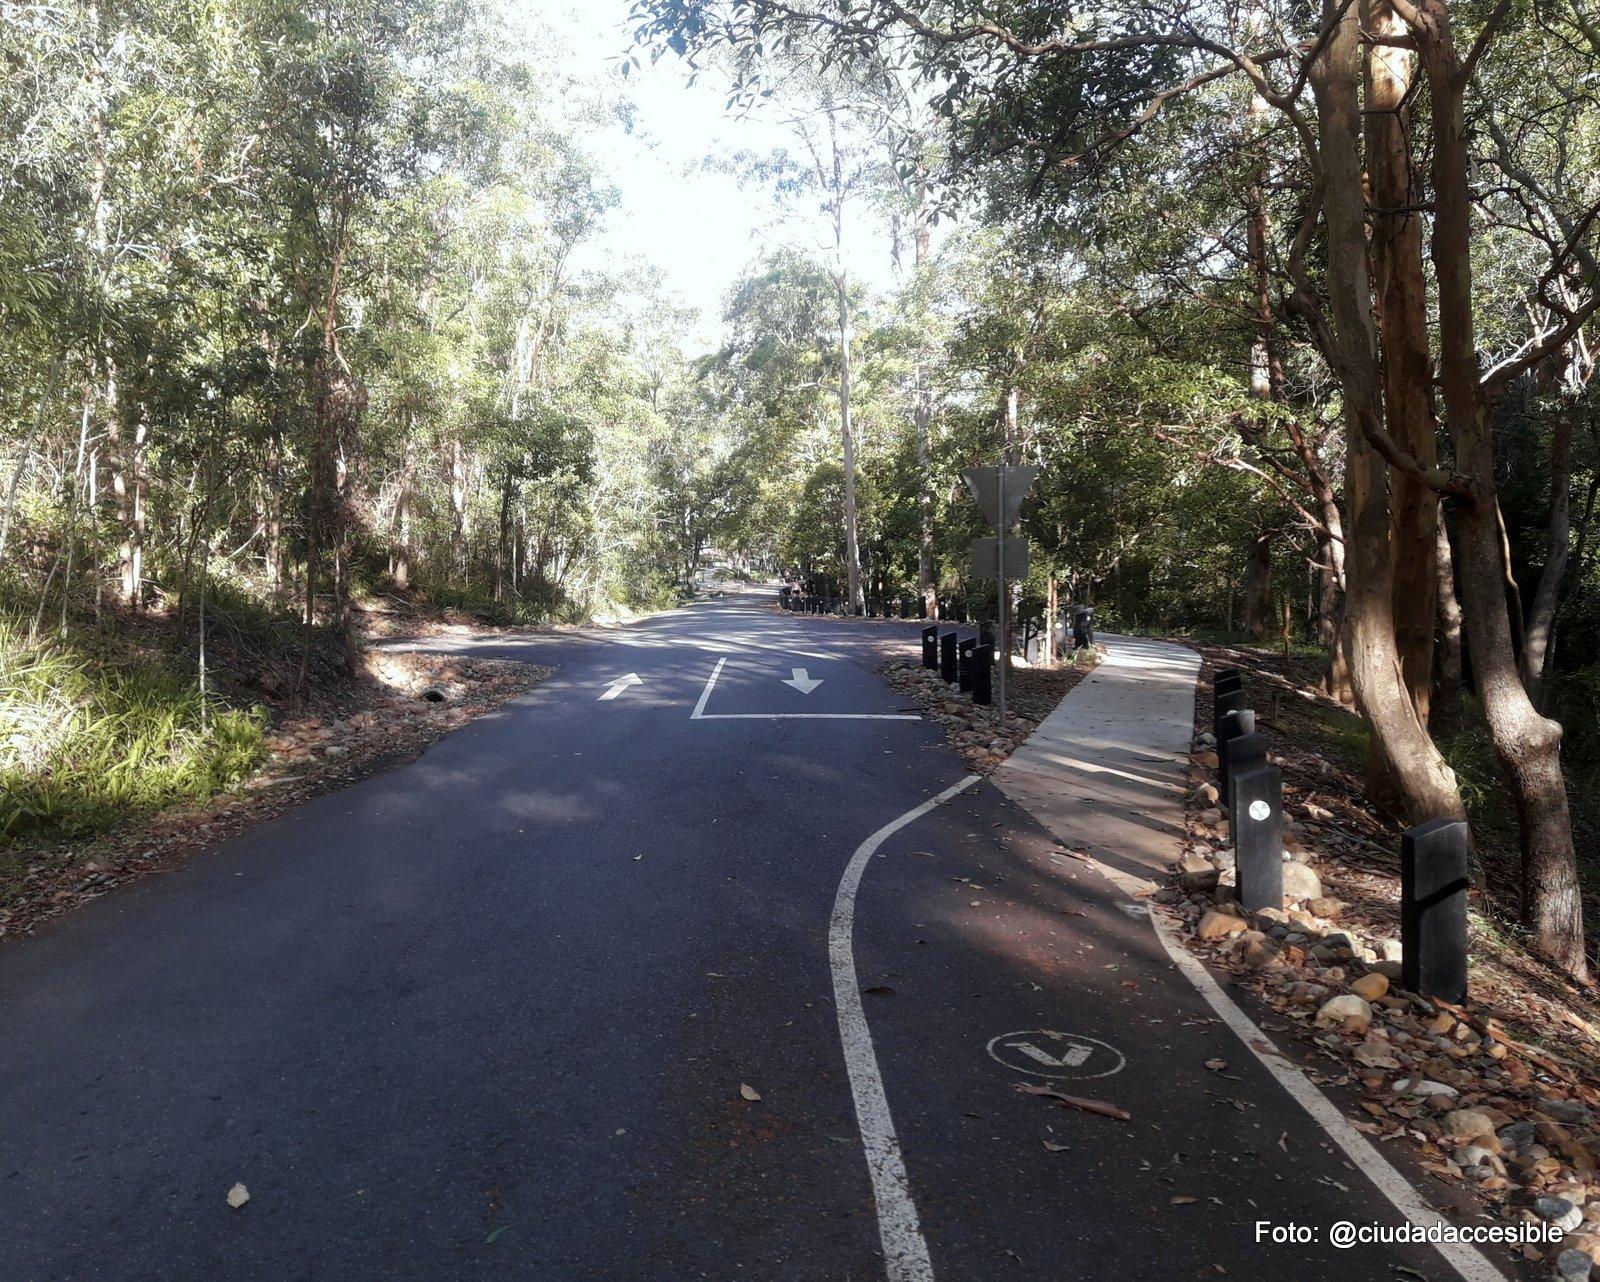 ruta peatonal demarcada junto a calzada vehicular en Parque Mount Coo-tha Brisbane